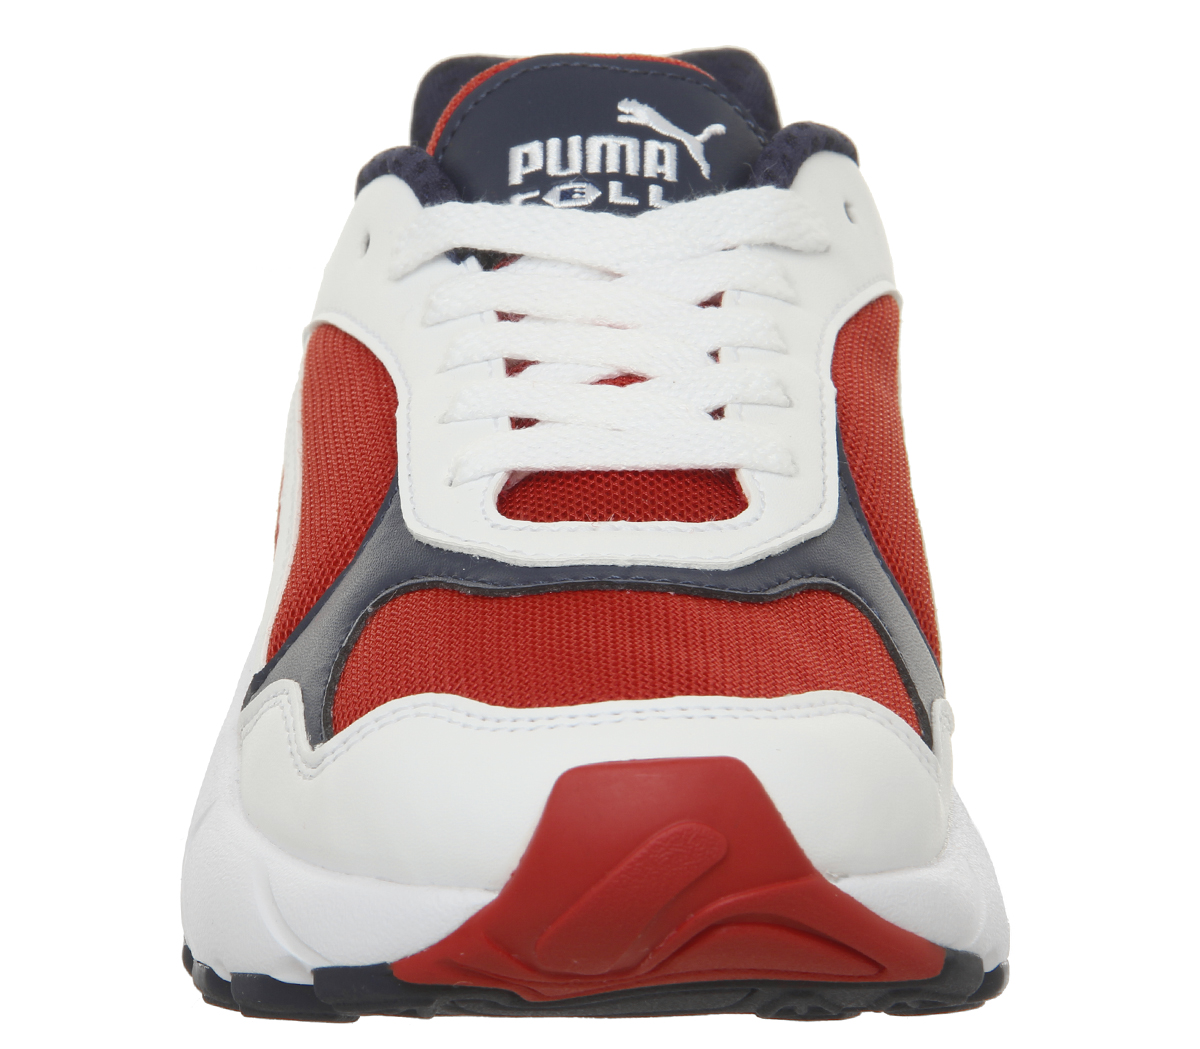 Homme-Puma-Cell-Viper-Baskets-PUMA-blanc-Risque-Eleve-Rouge-Baskets miniature 4